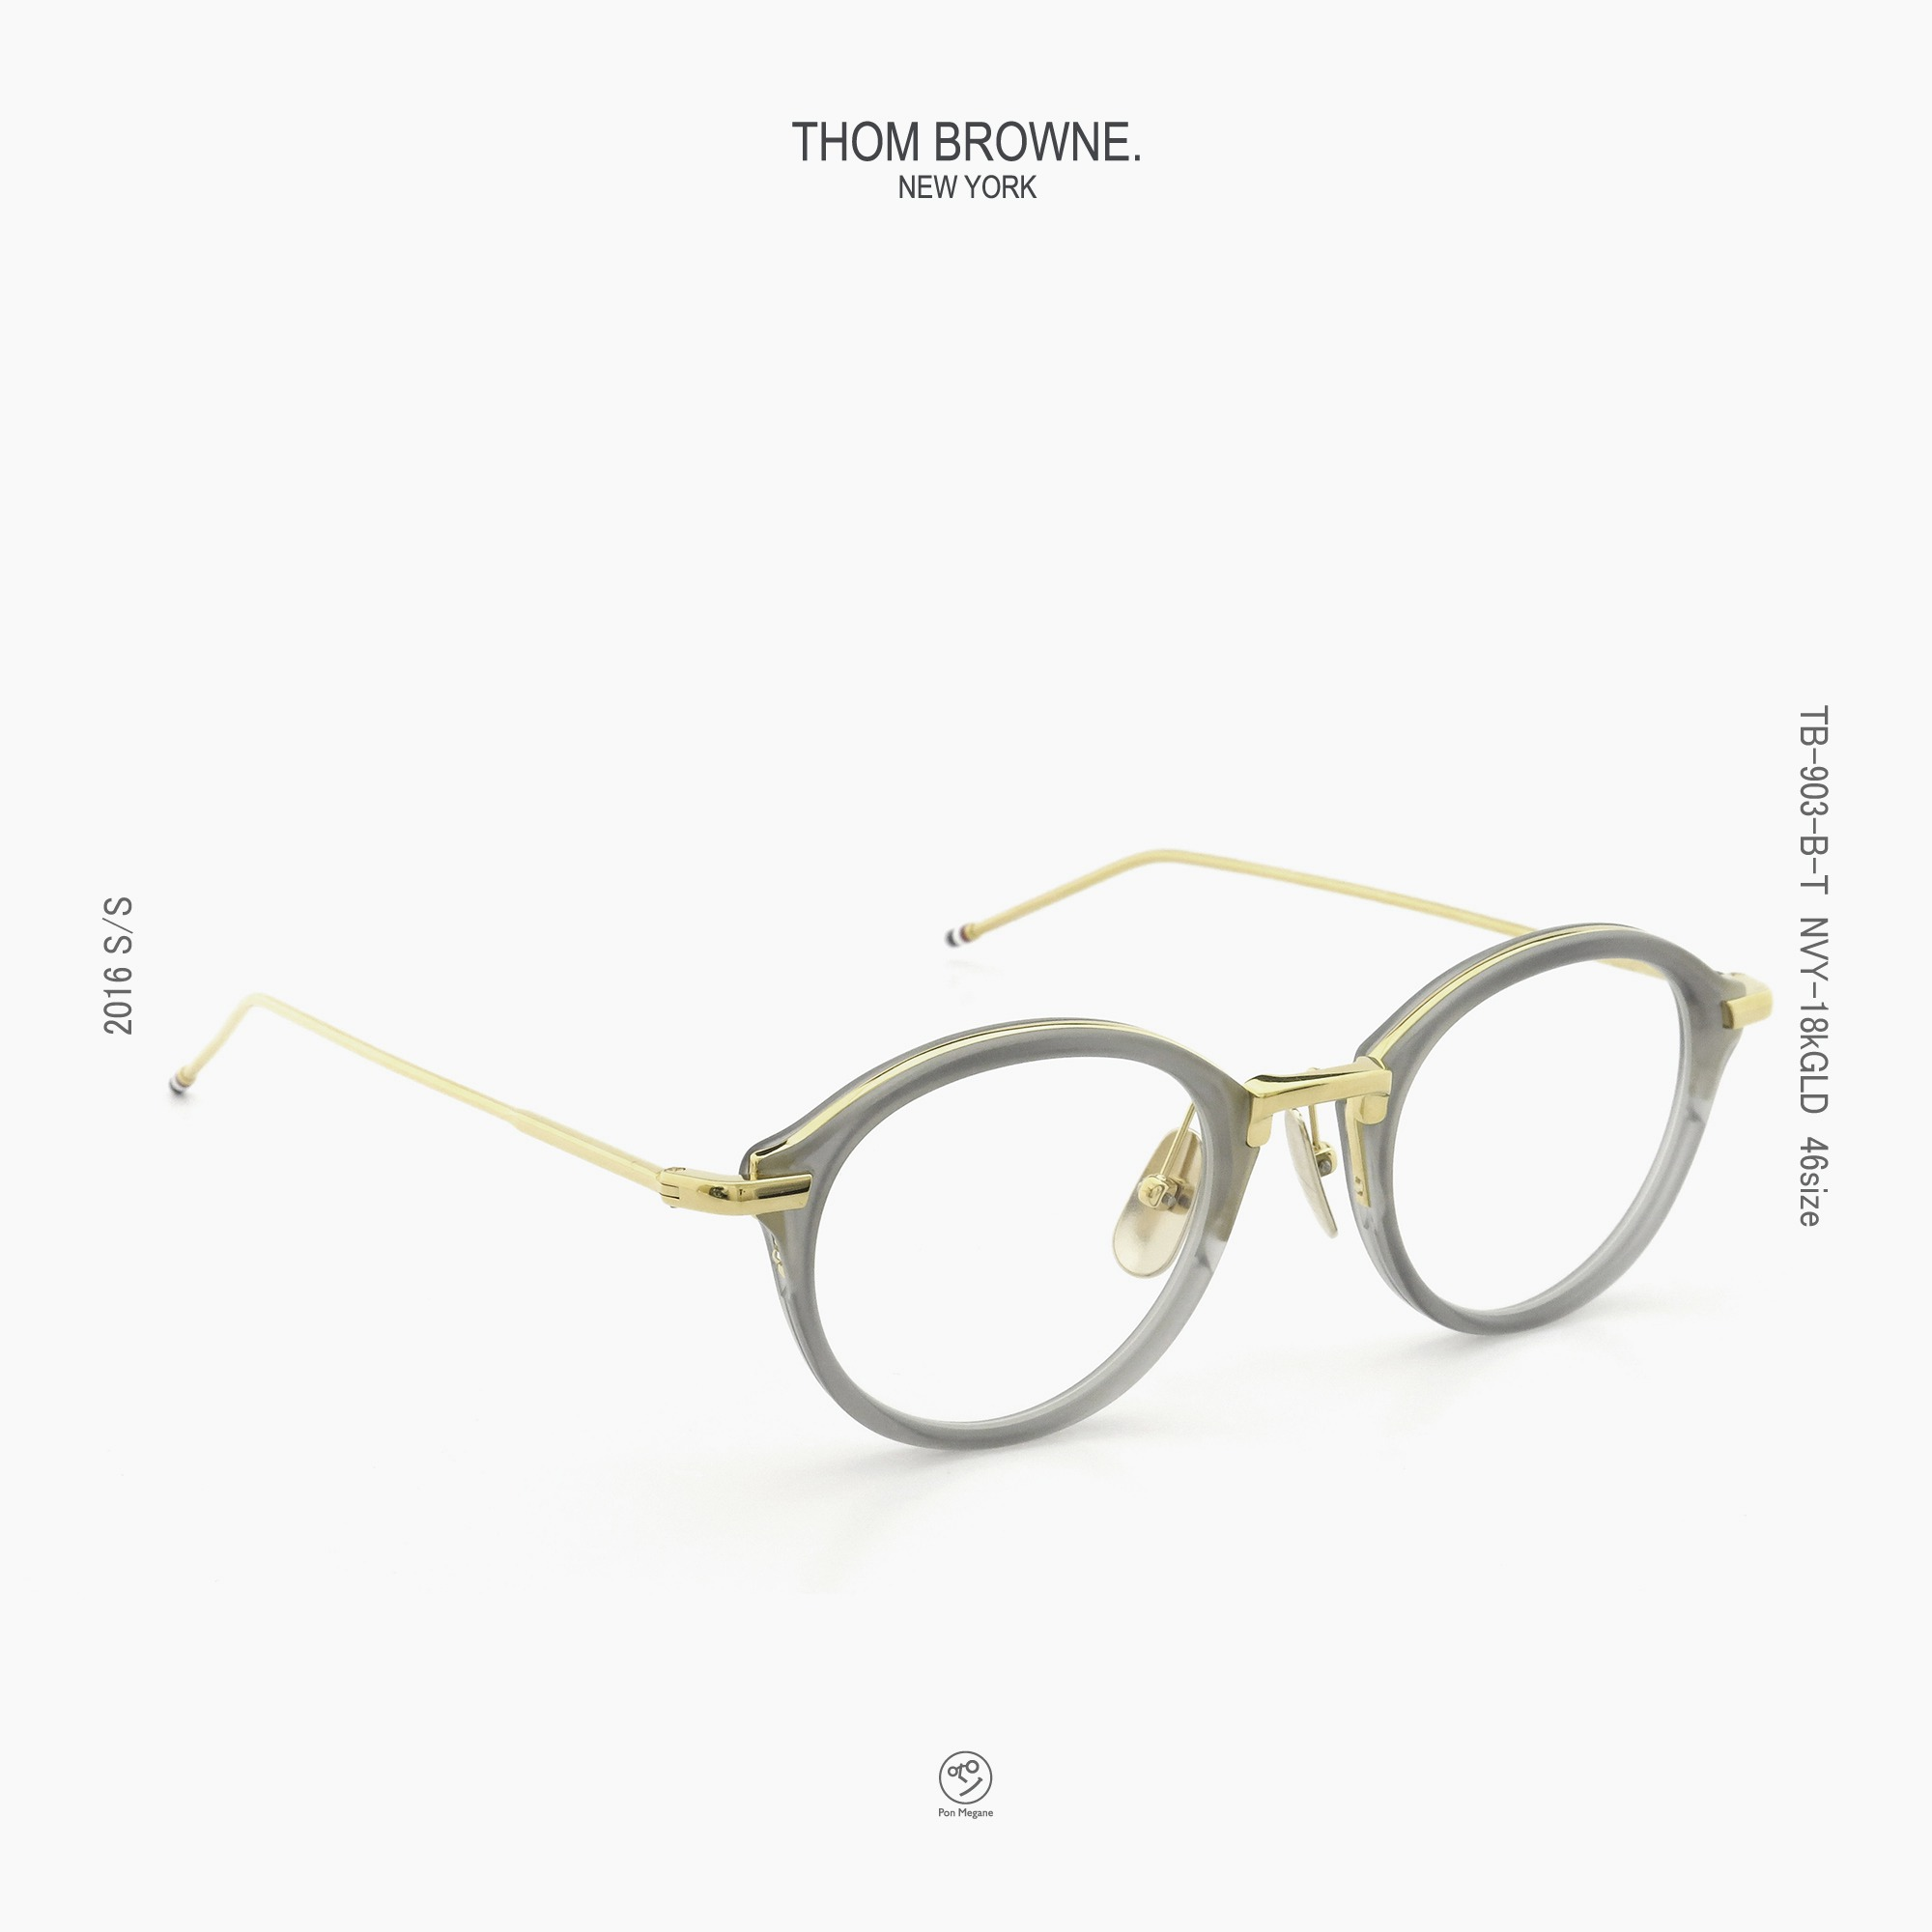 THOM-BROWNE_TB-011-G_GRY-18KGLD_46_insta